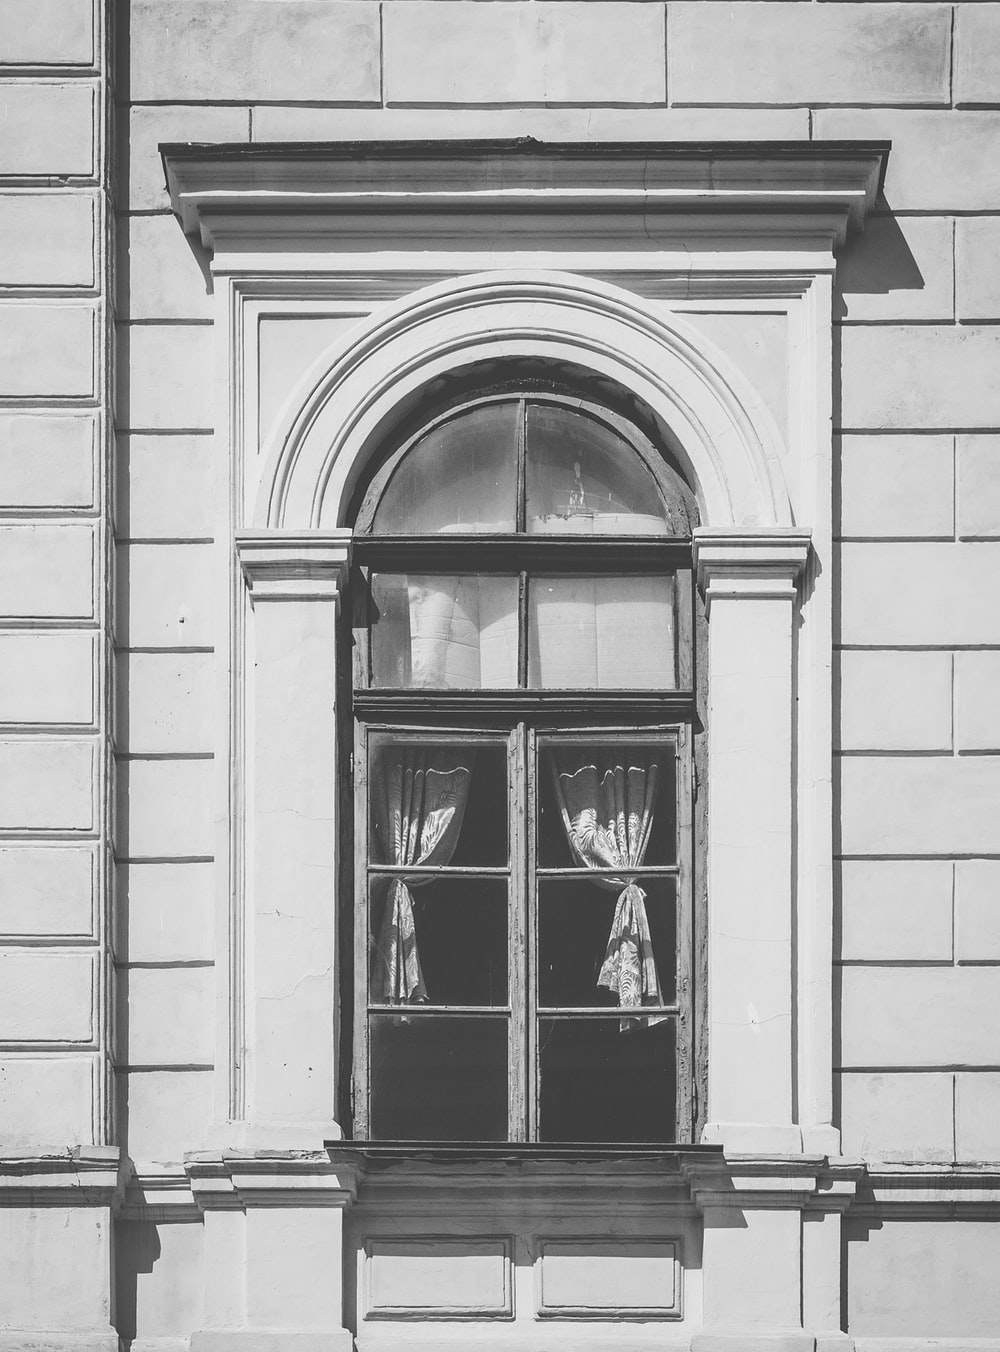 gray concrete window frame